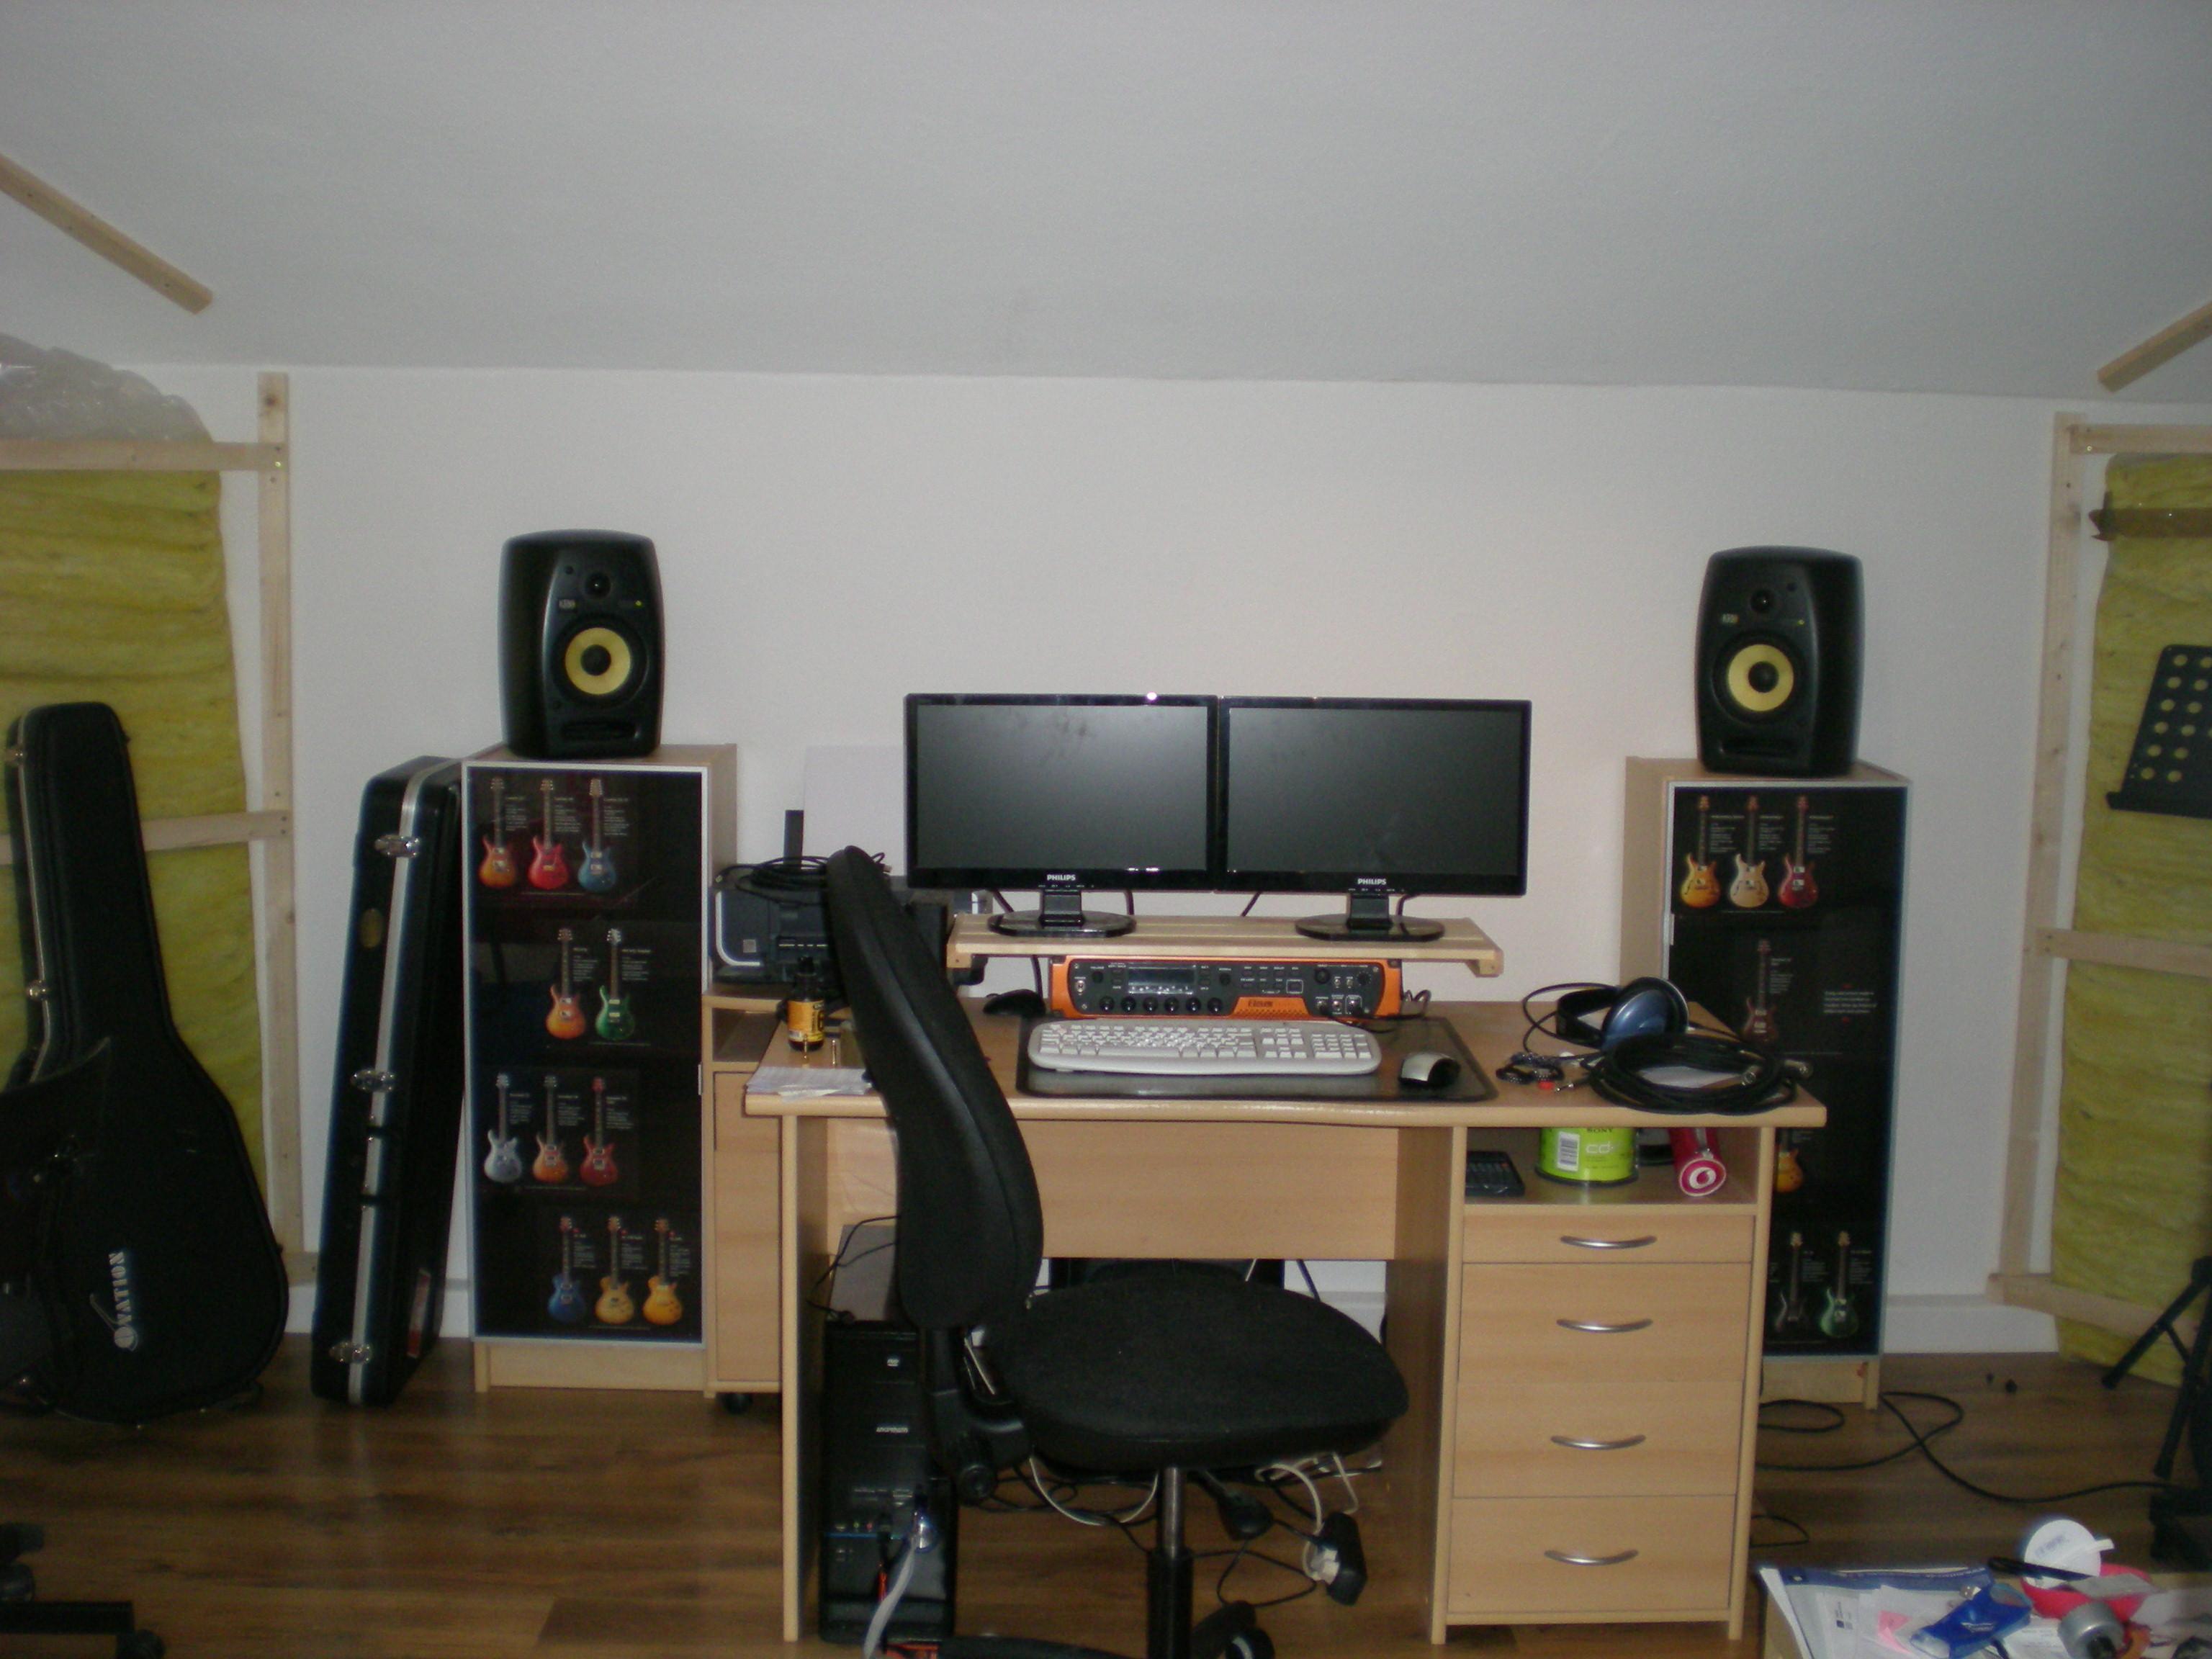 Studio Monitor Stand Desk Mount Solution Gearslutz Com